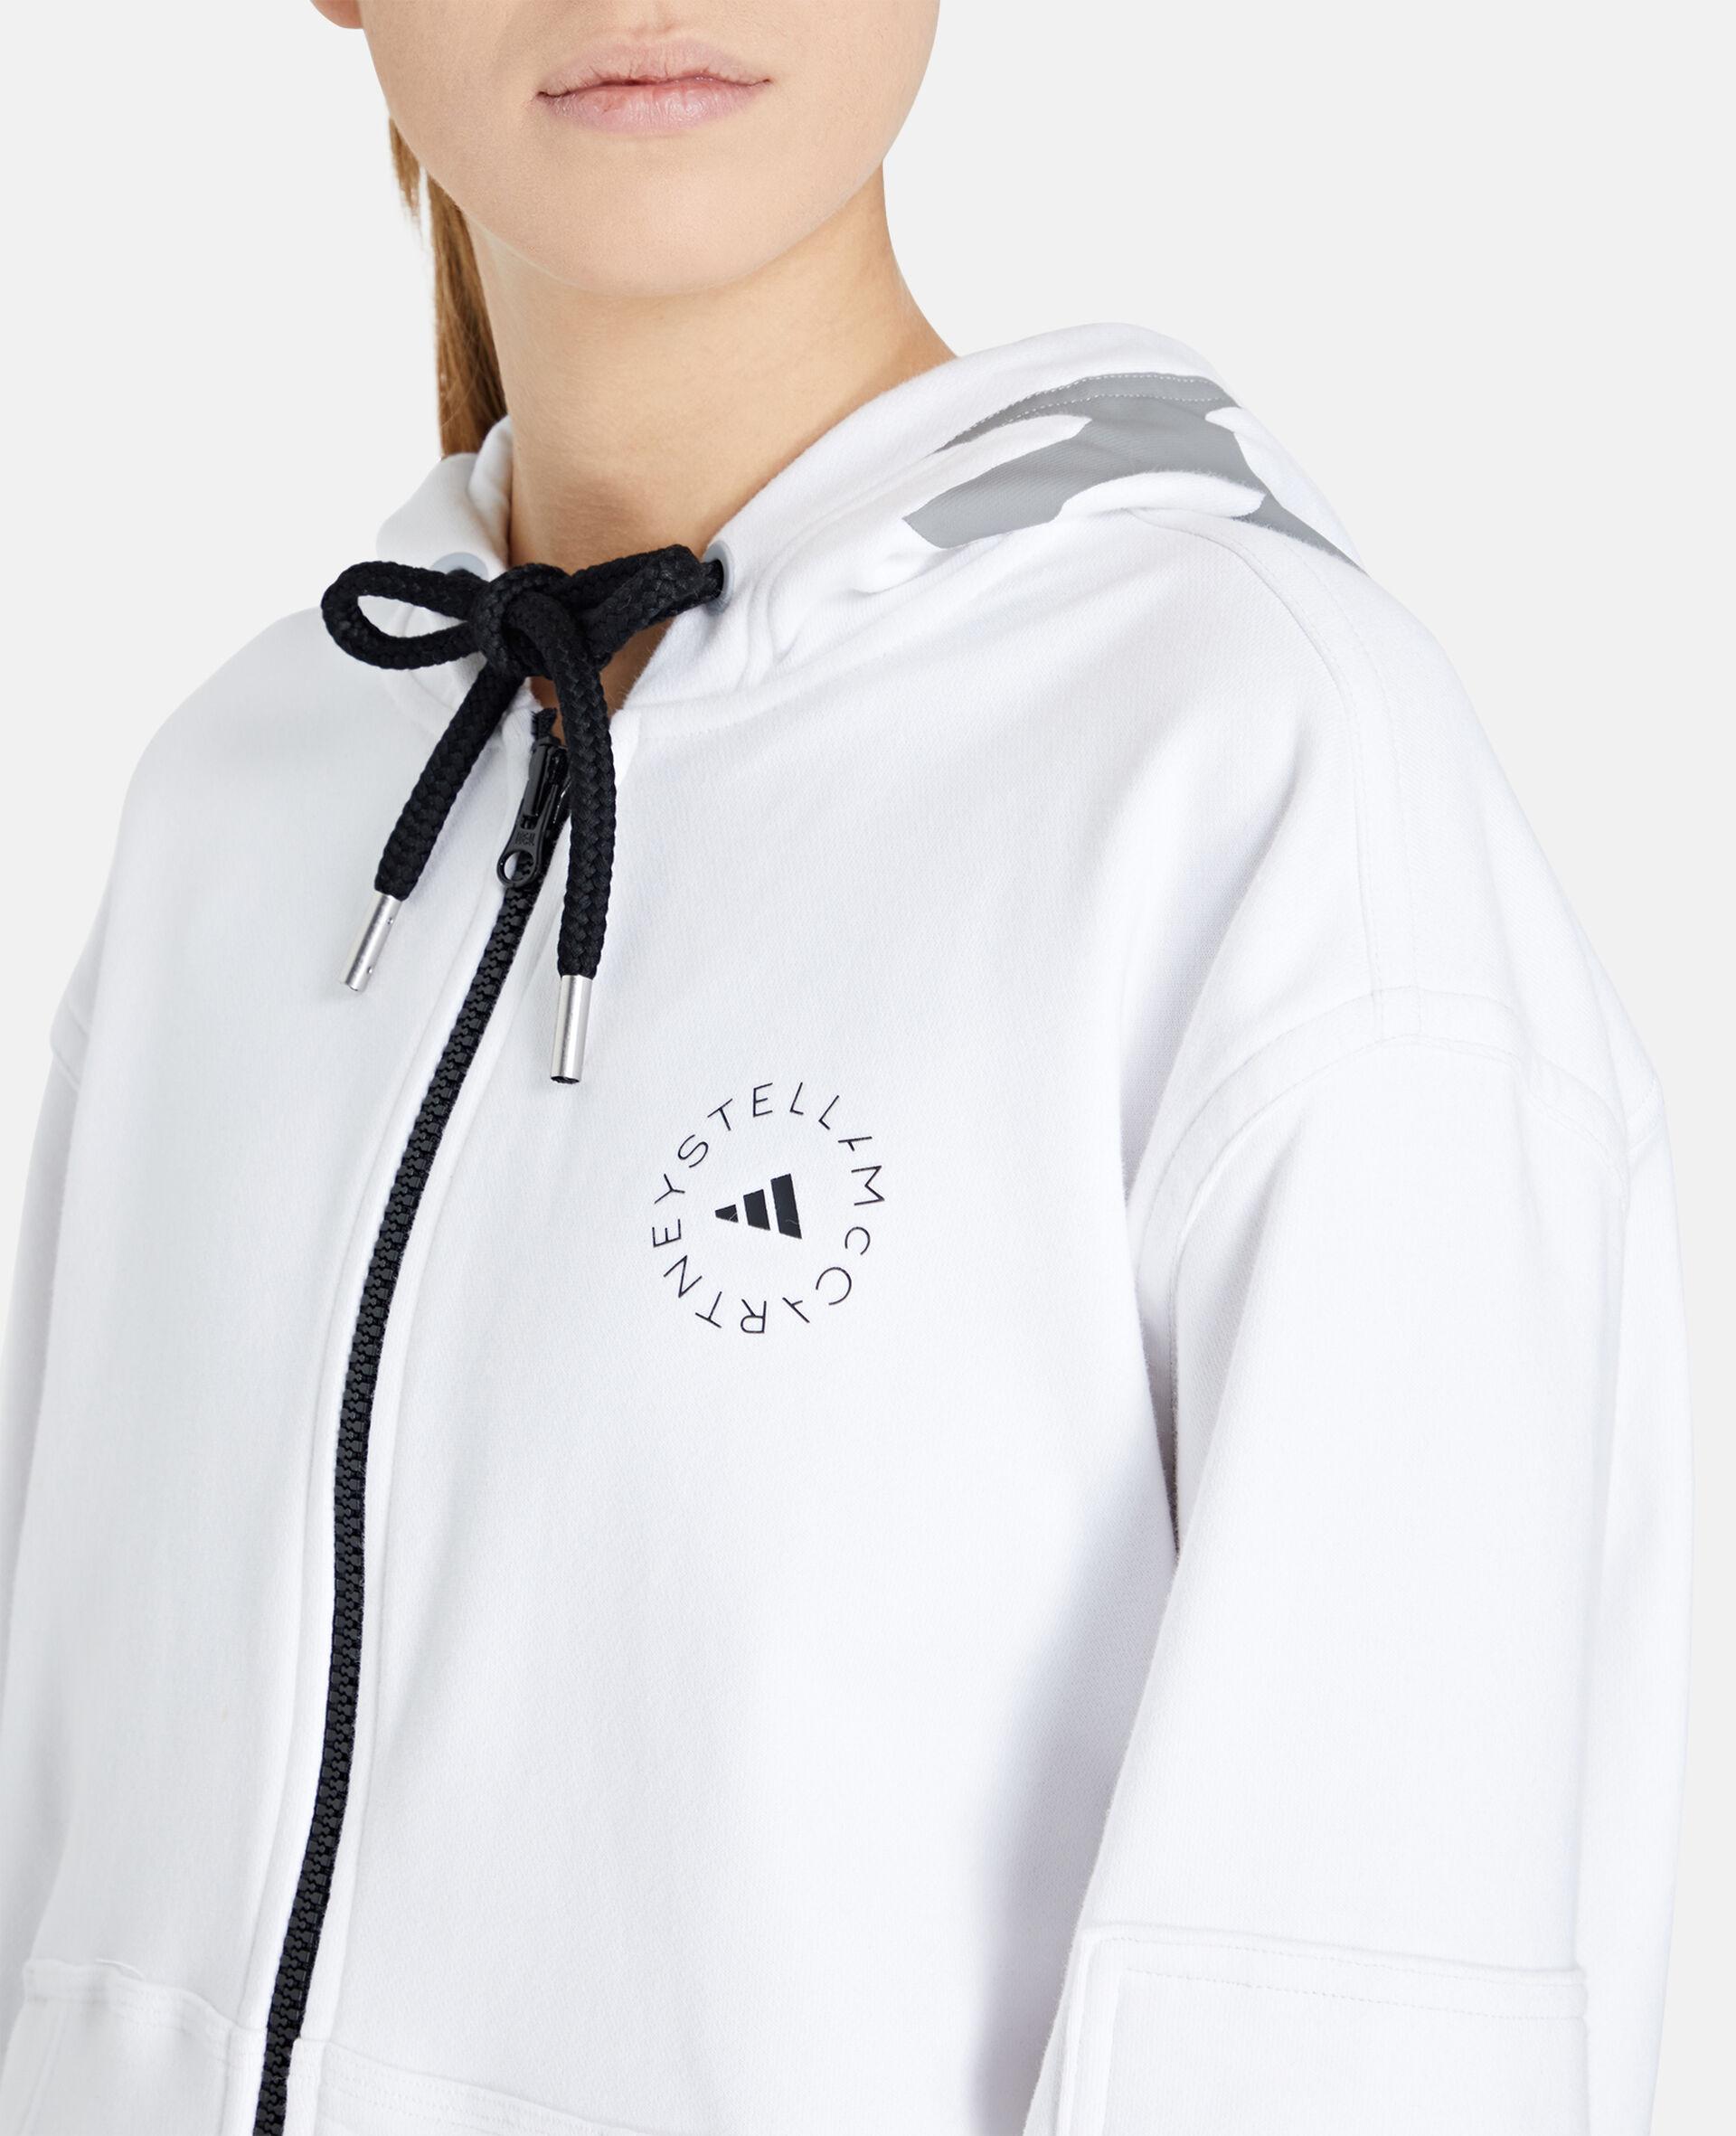 White Full-zip Hoodie-White-large image number 3